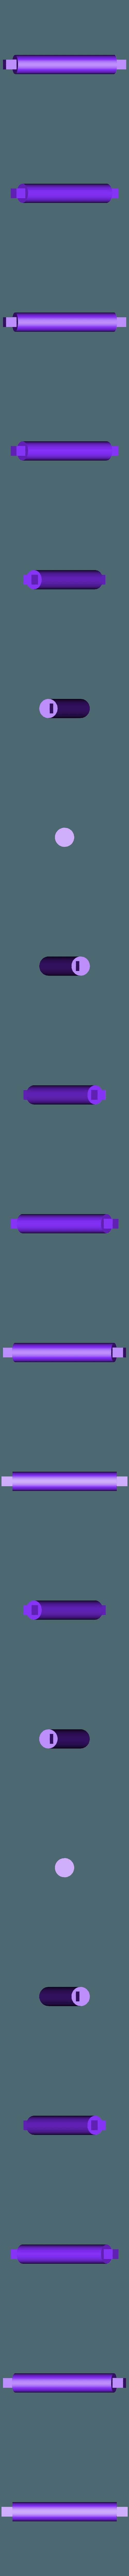 lever-axle.stl Download free STL file Steampunk Oculus Roboticus • 3D print design, cyrusharding